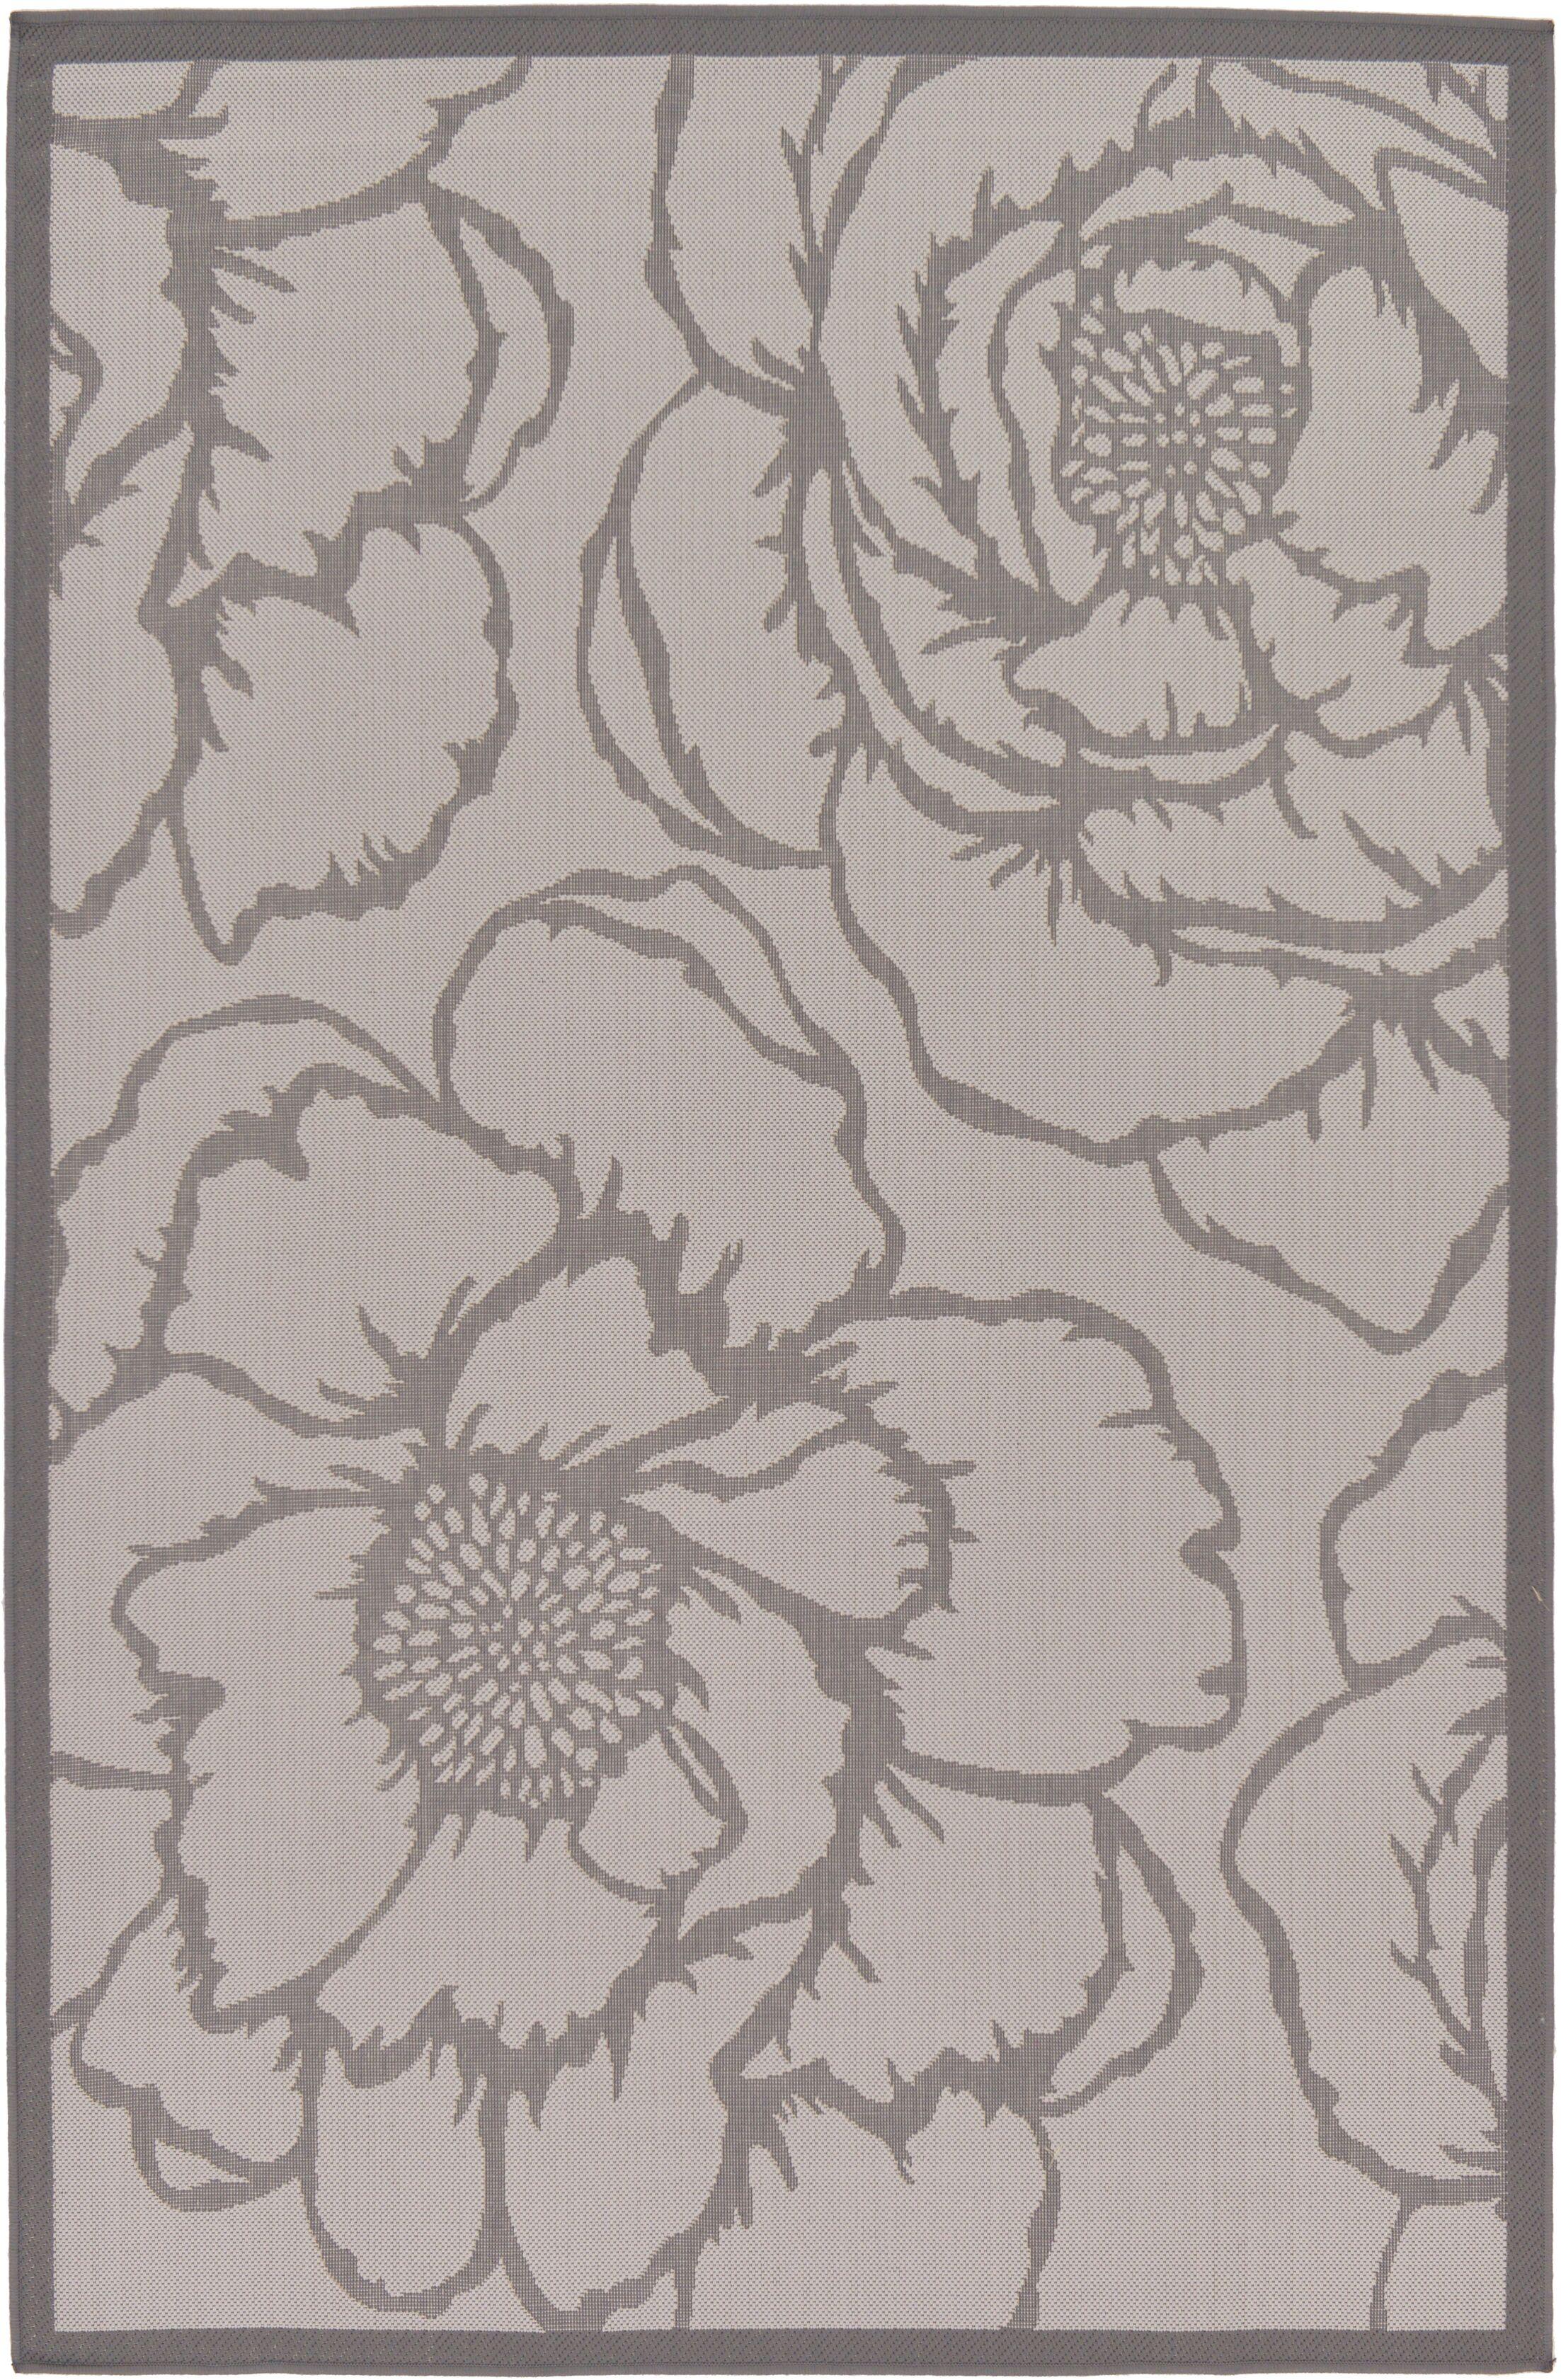 Barriga Gray Outdoor Area Rug Rug Size: Rectangle 5'3